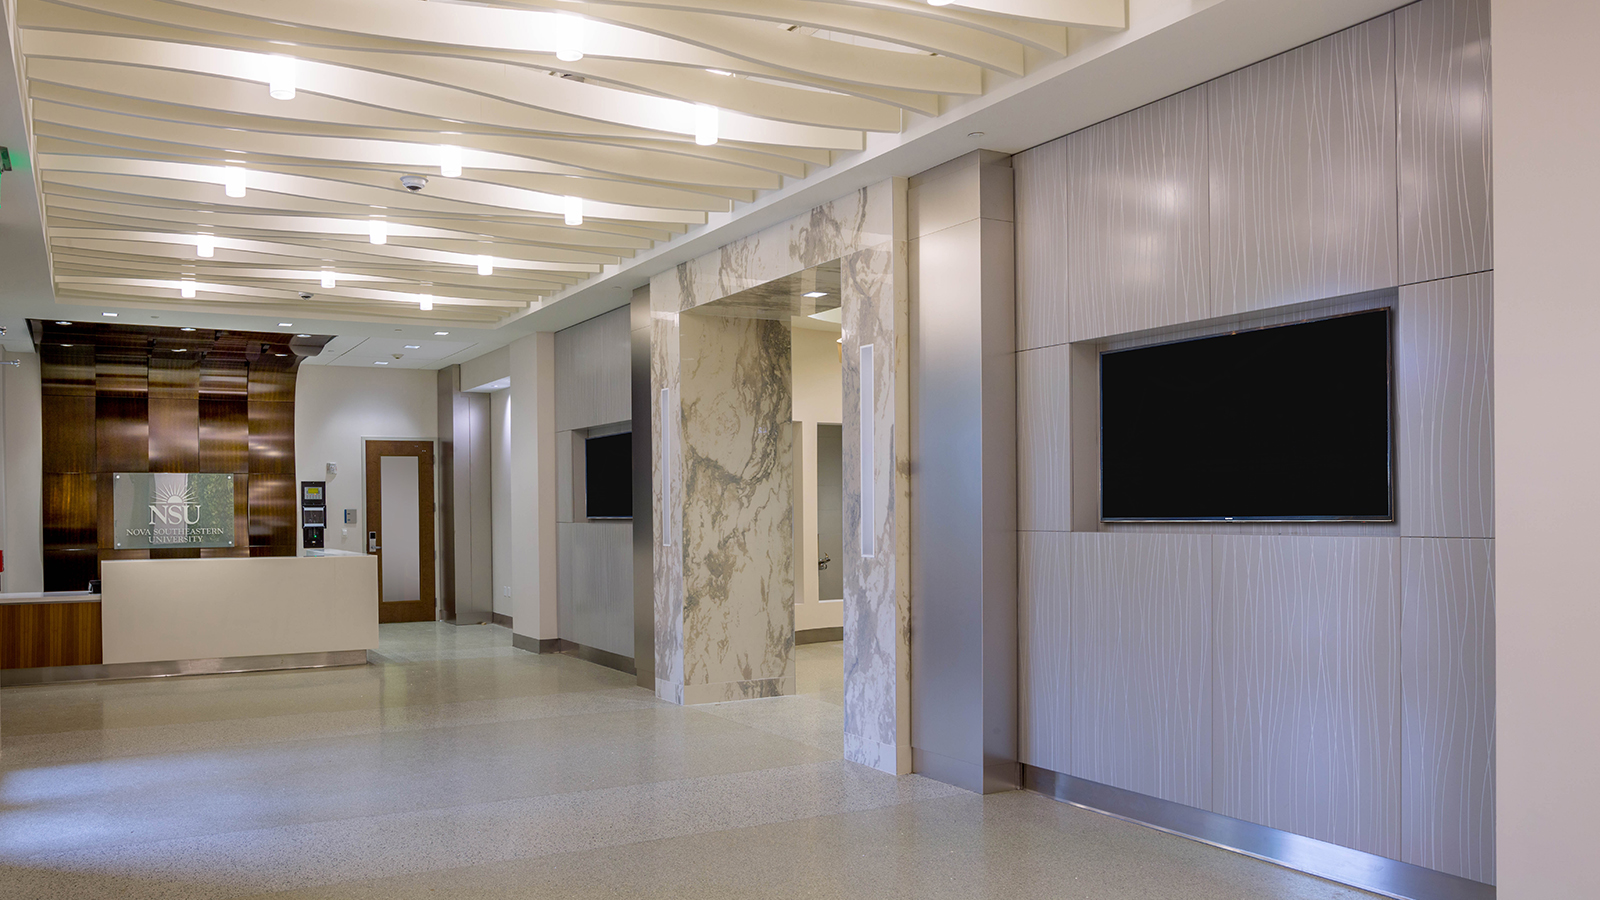 ... Moz Designer Metals, Keyway Wall Panels, Interior Design, Architecture  ...